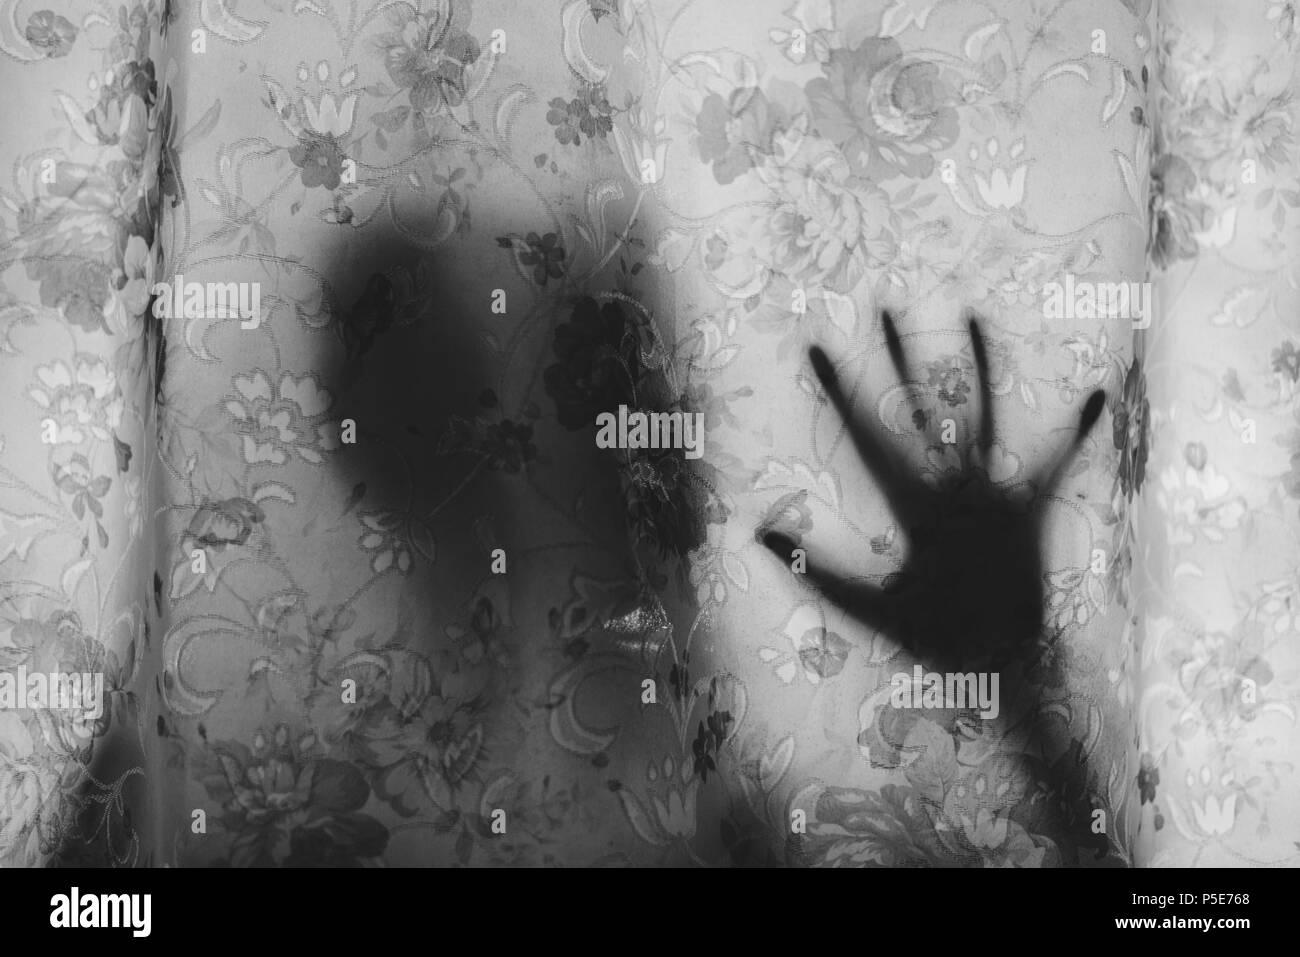 Creepy Black And White Photography